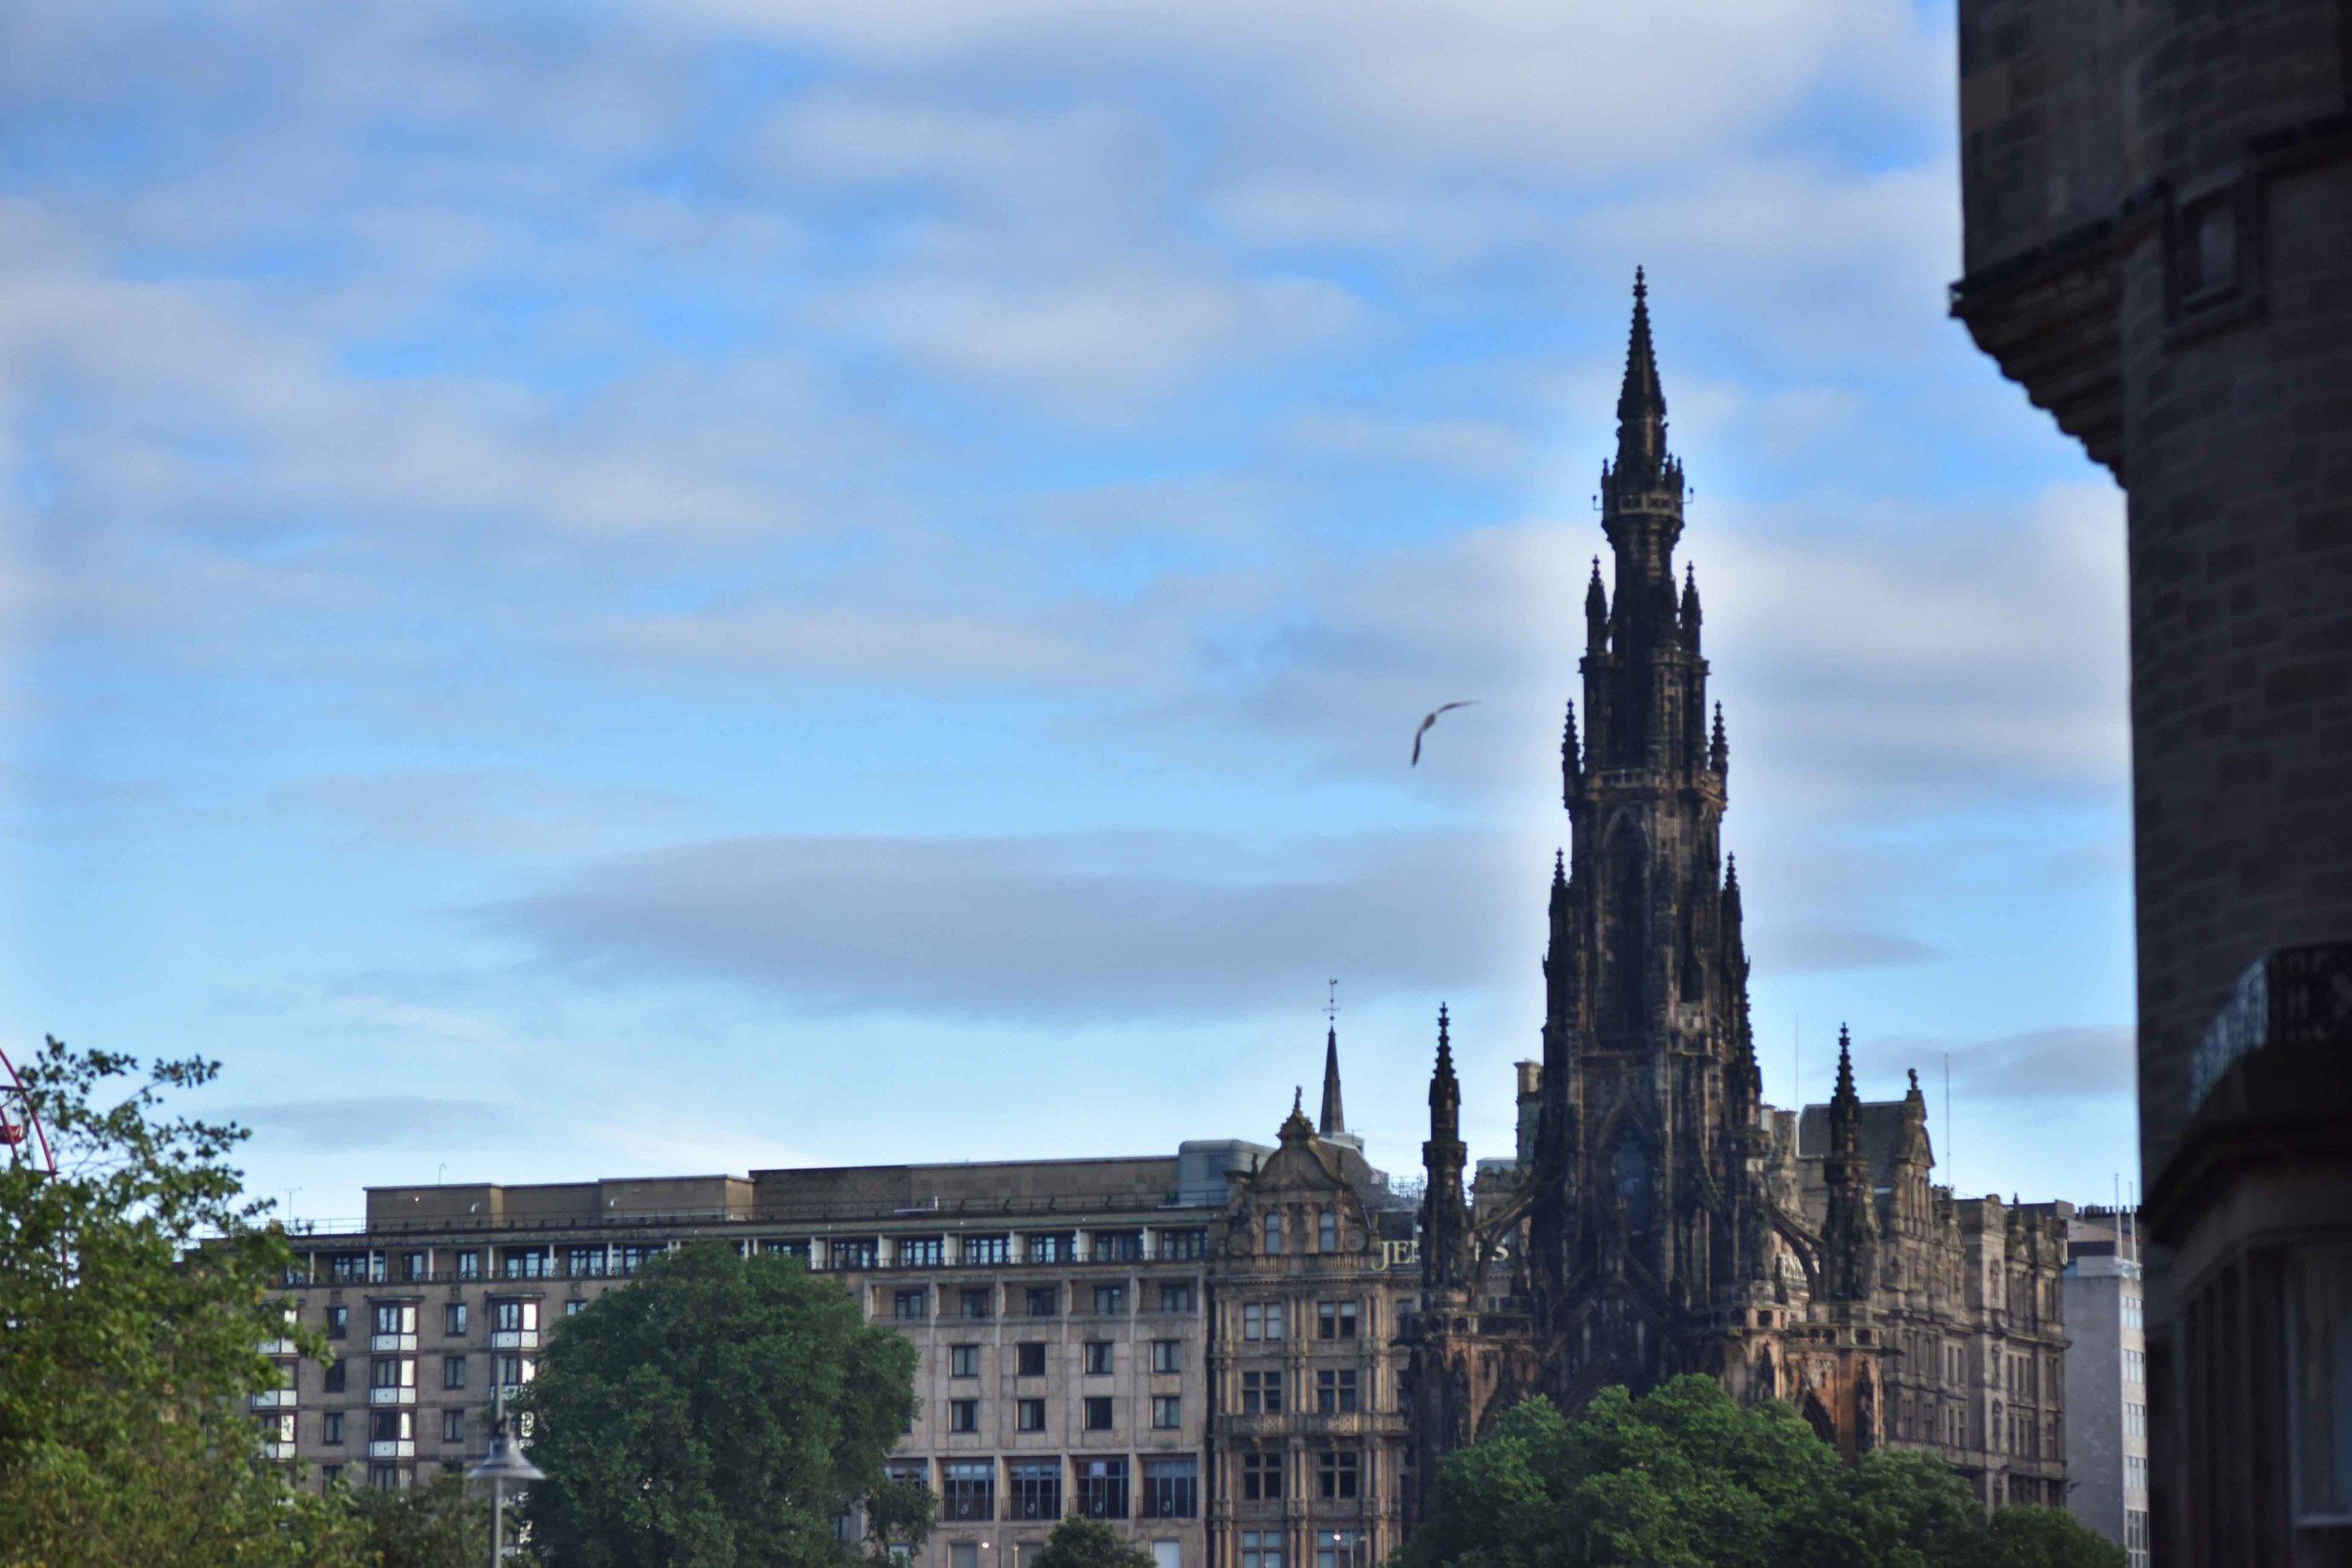 Old Town, Edinburgh, Scotland. Image©thingstodot.com